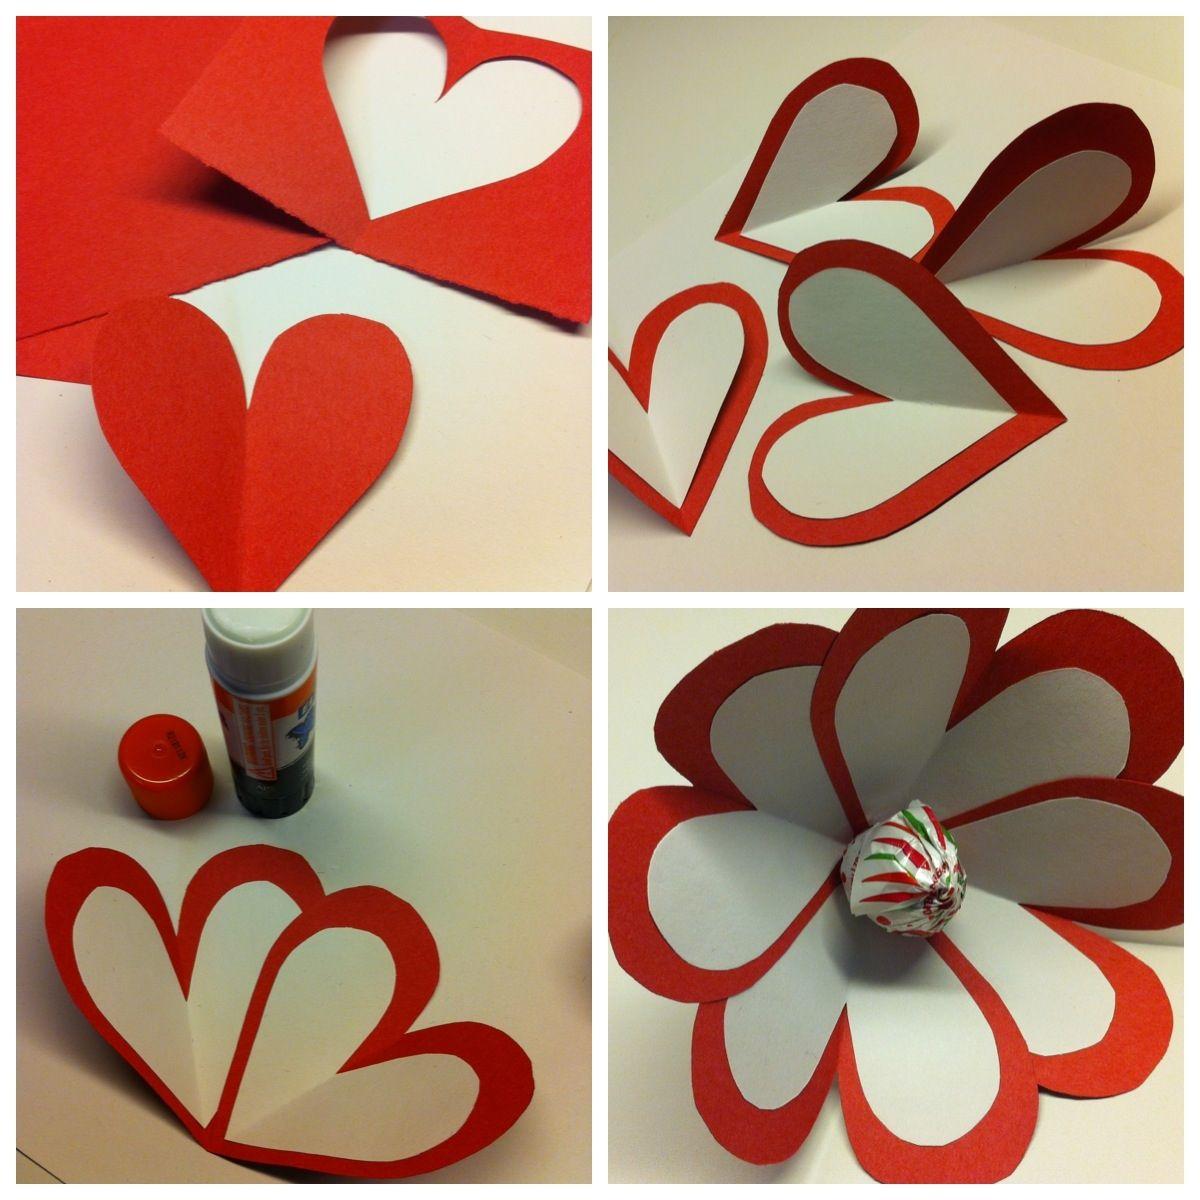 valentines day crafts kids can make